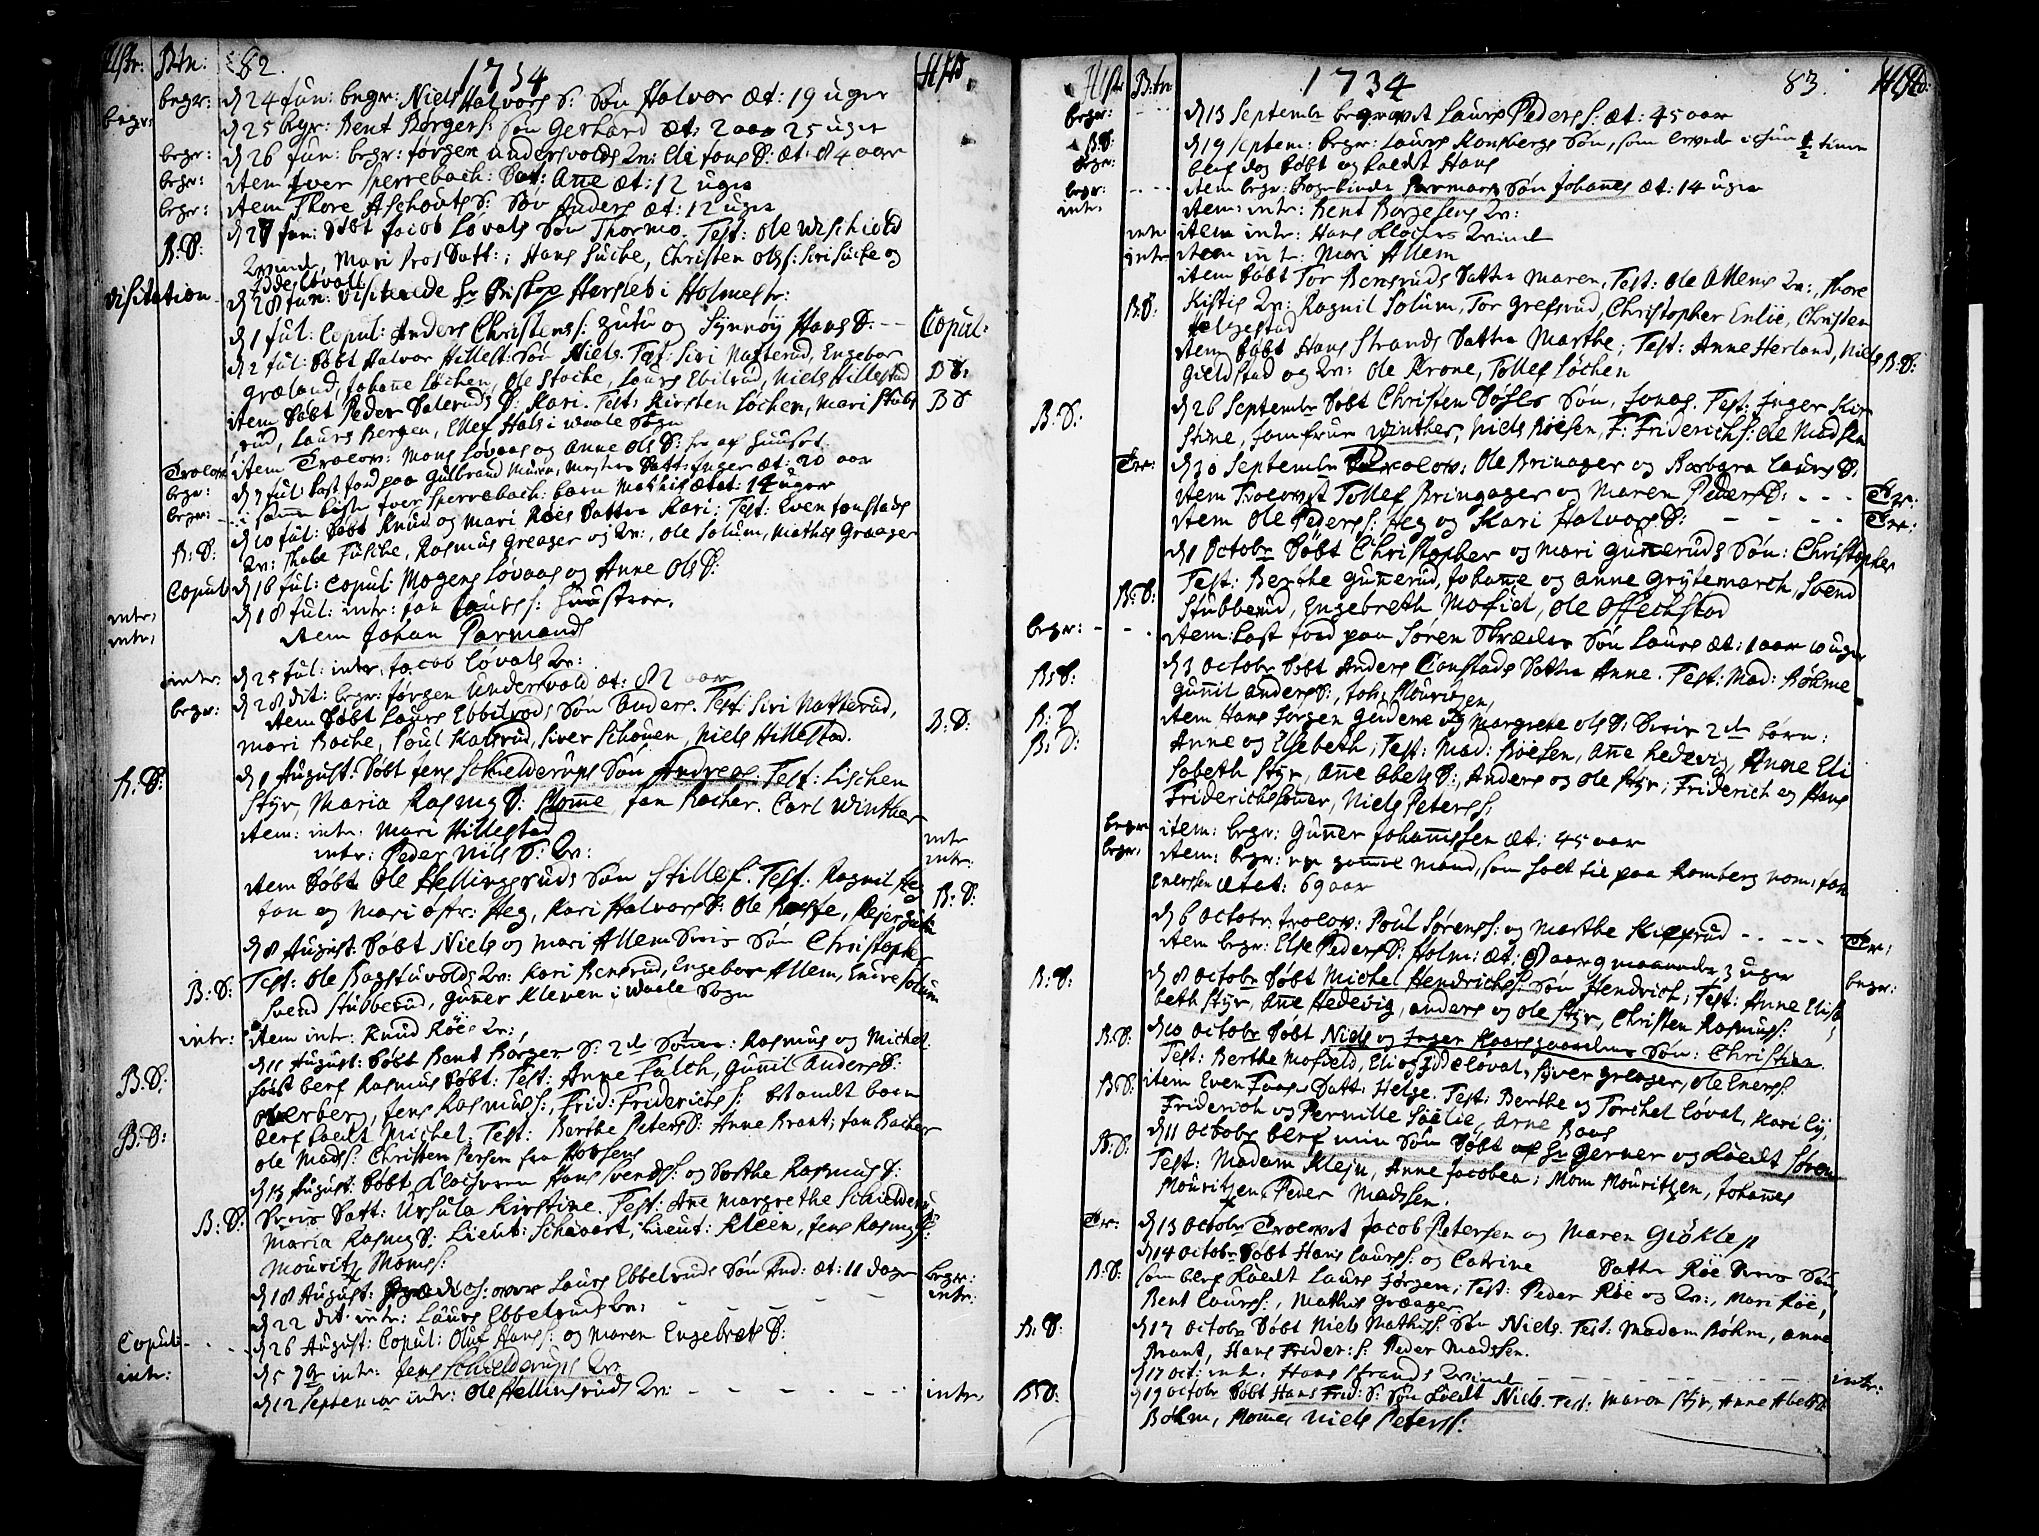 SAKO, Botne kirkebøker, F/Fa/L0001a: Ministerialbok nr. I 1A, 1707-1778, s. 82-83